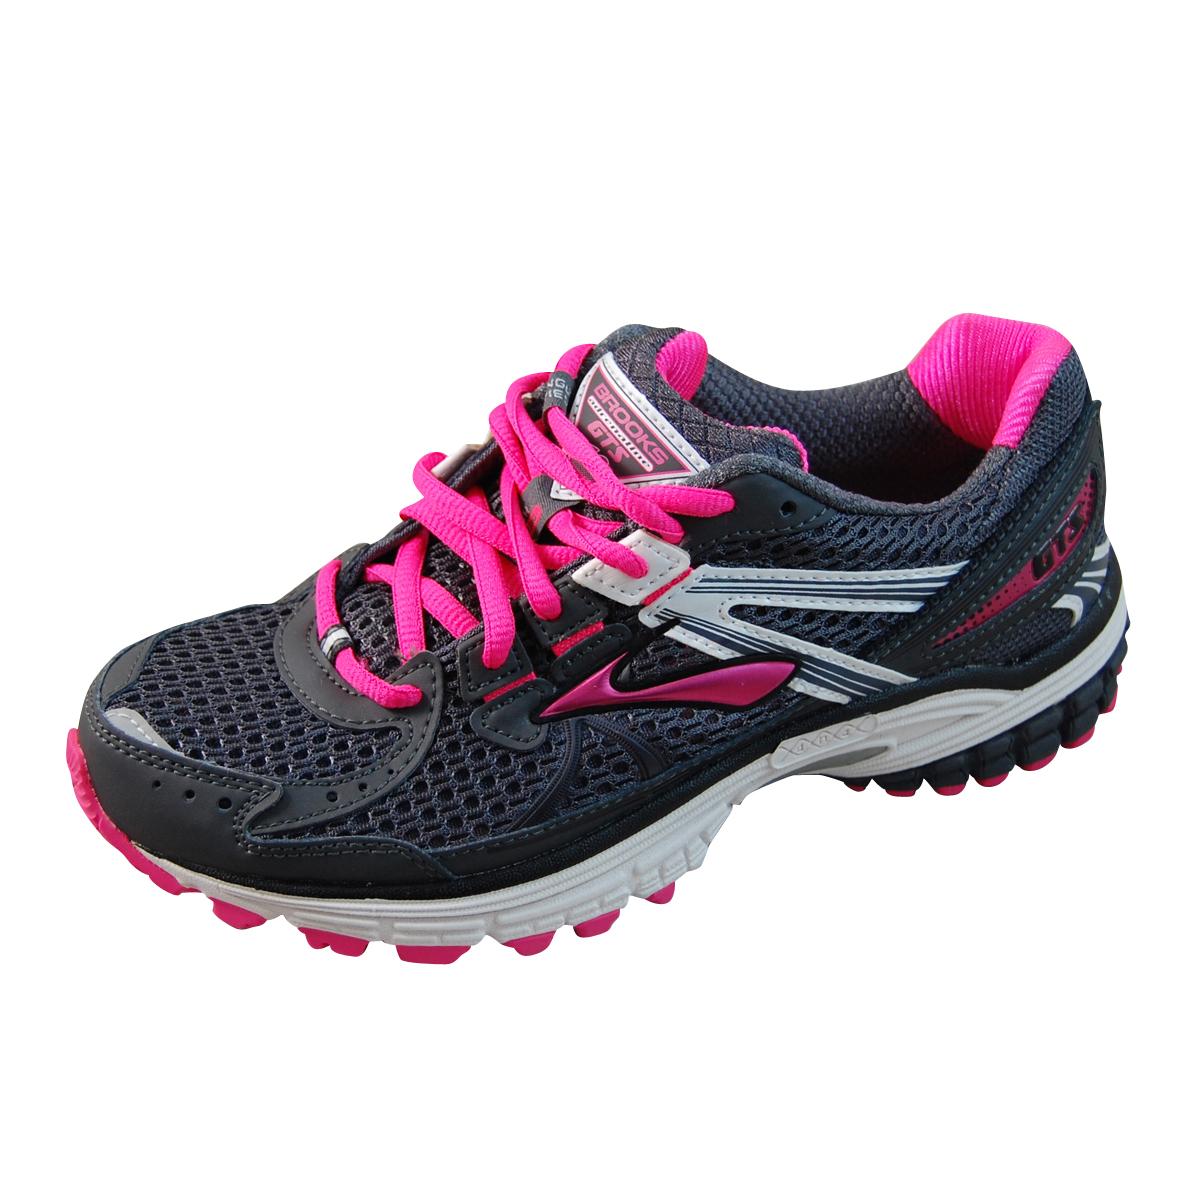 Brooks Adrenaline Gts Womens Running Shoes